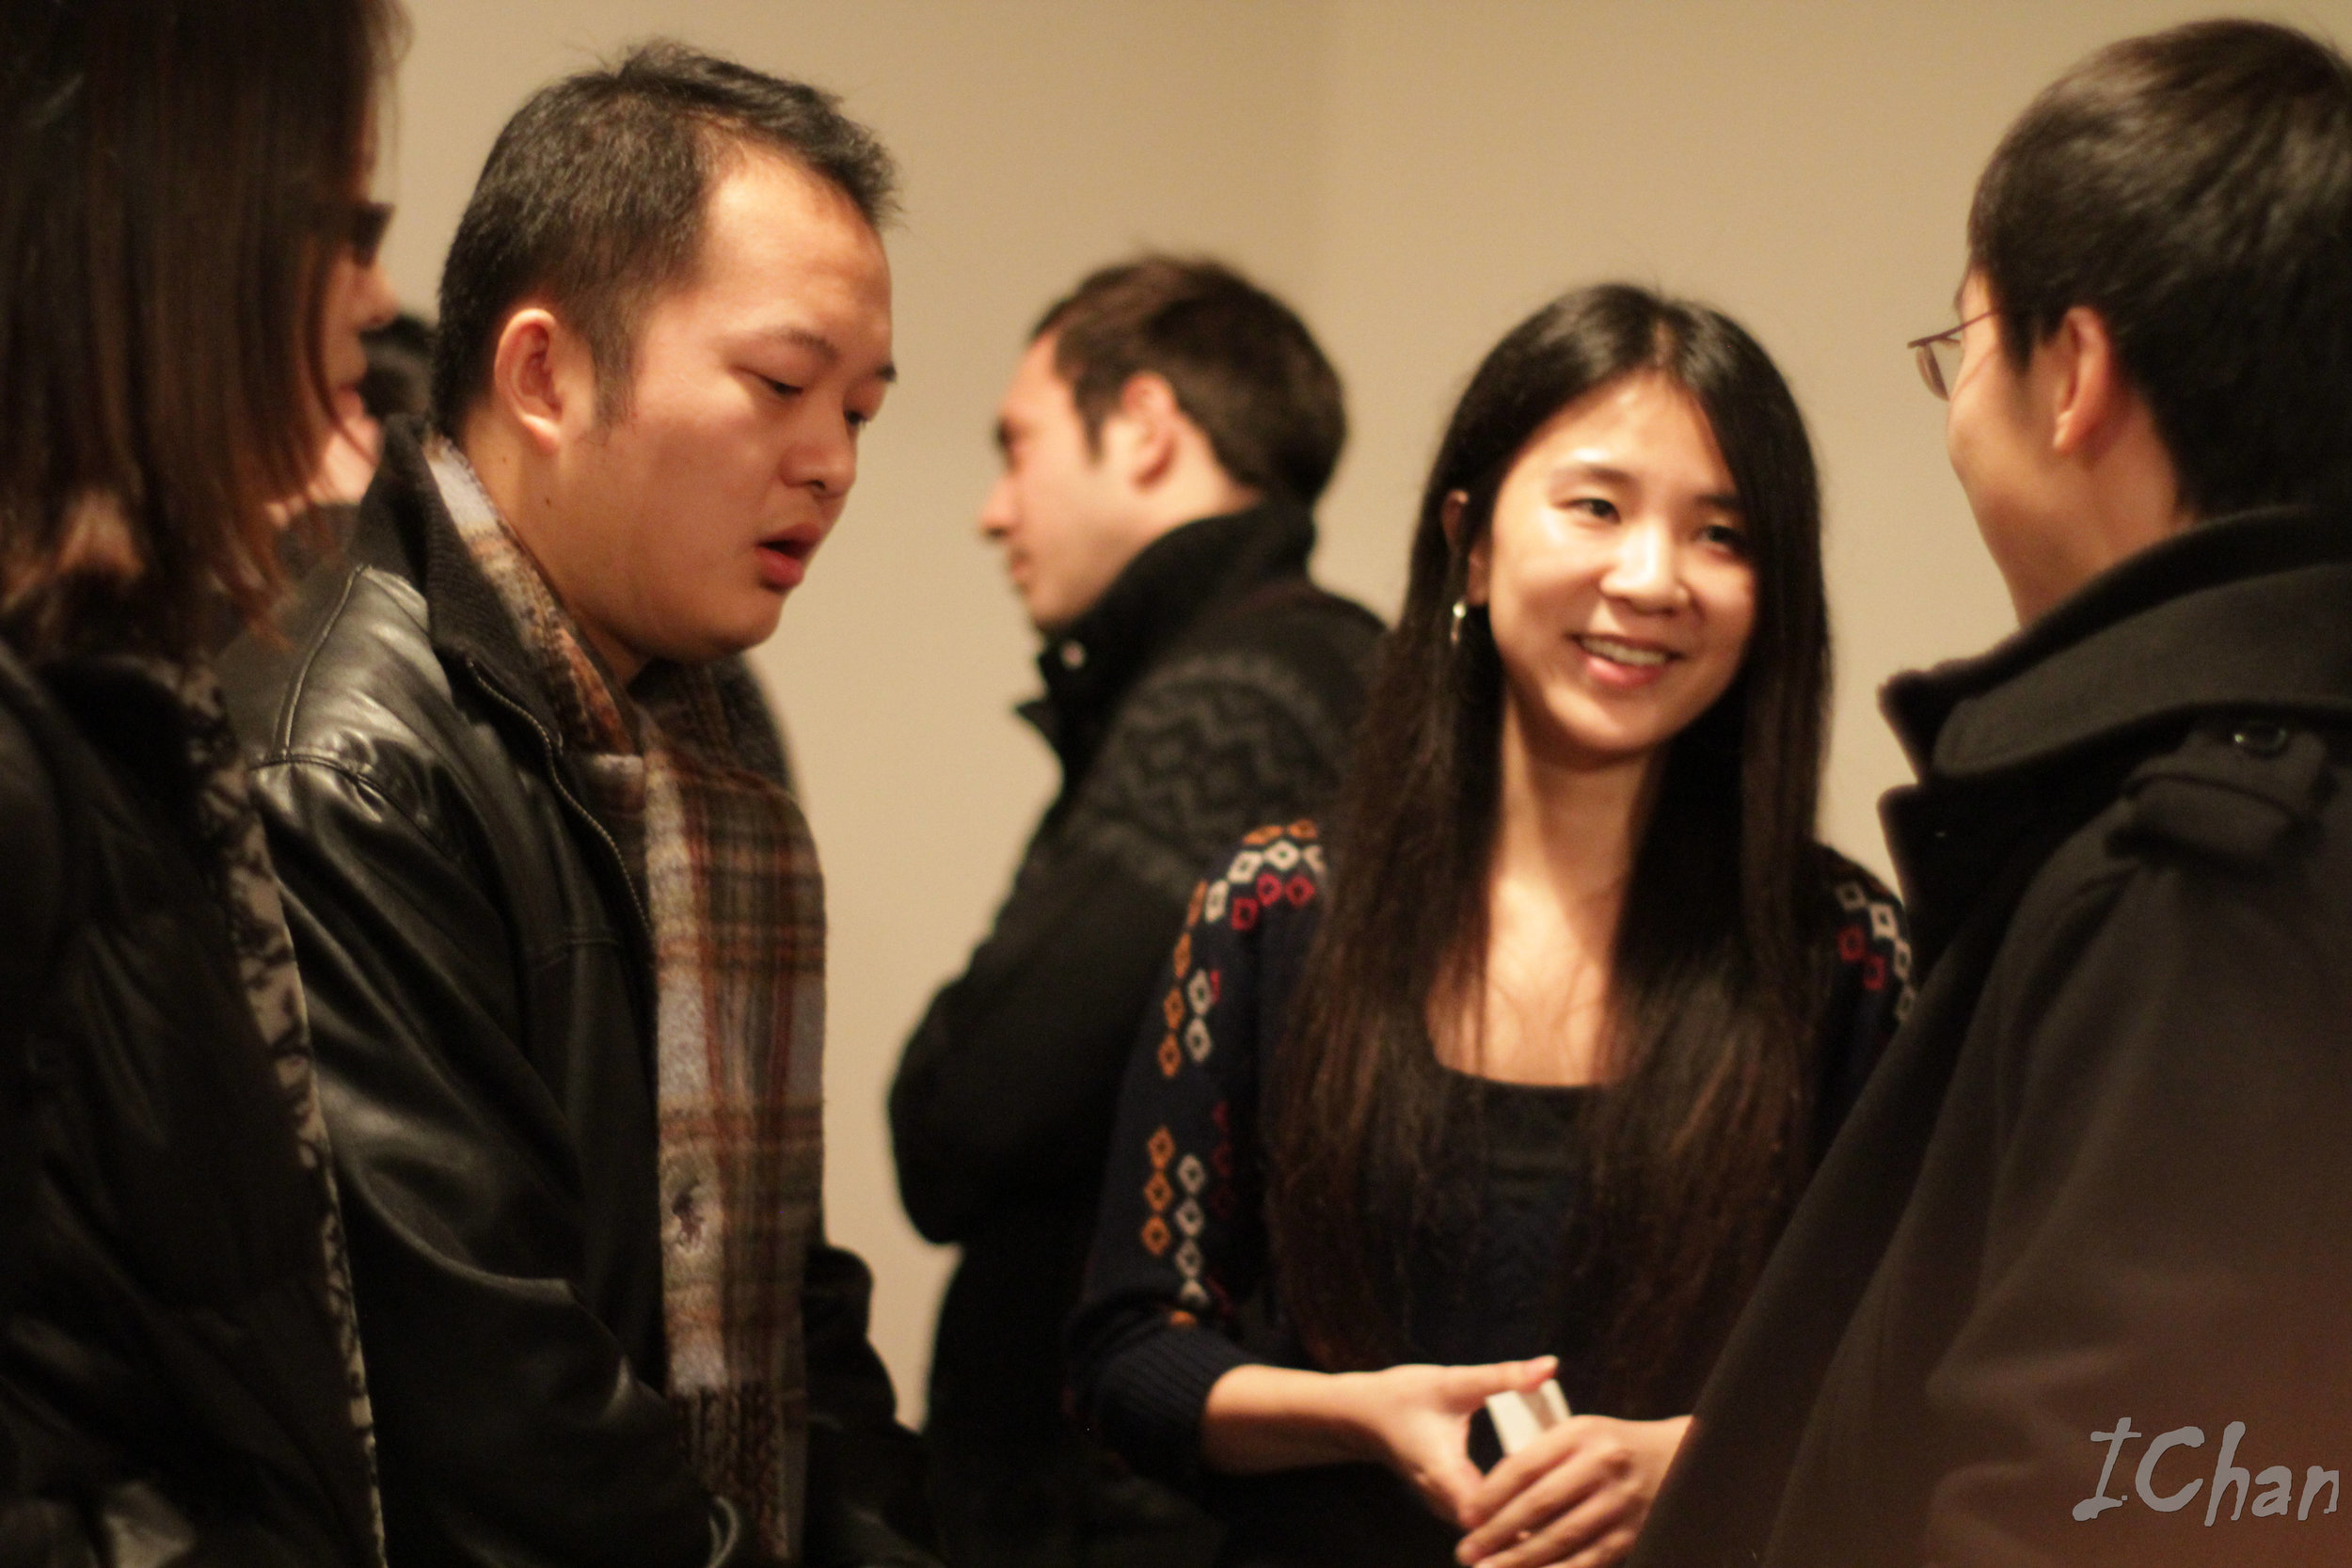 UNTITLEDdialogue 8 未命题对话: 陳東楠 Chen Dongnan